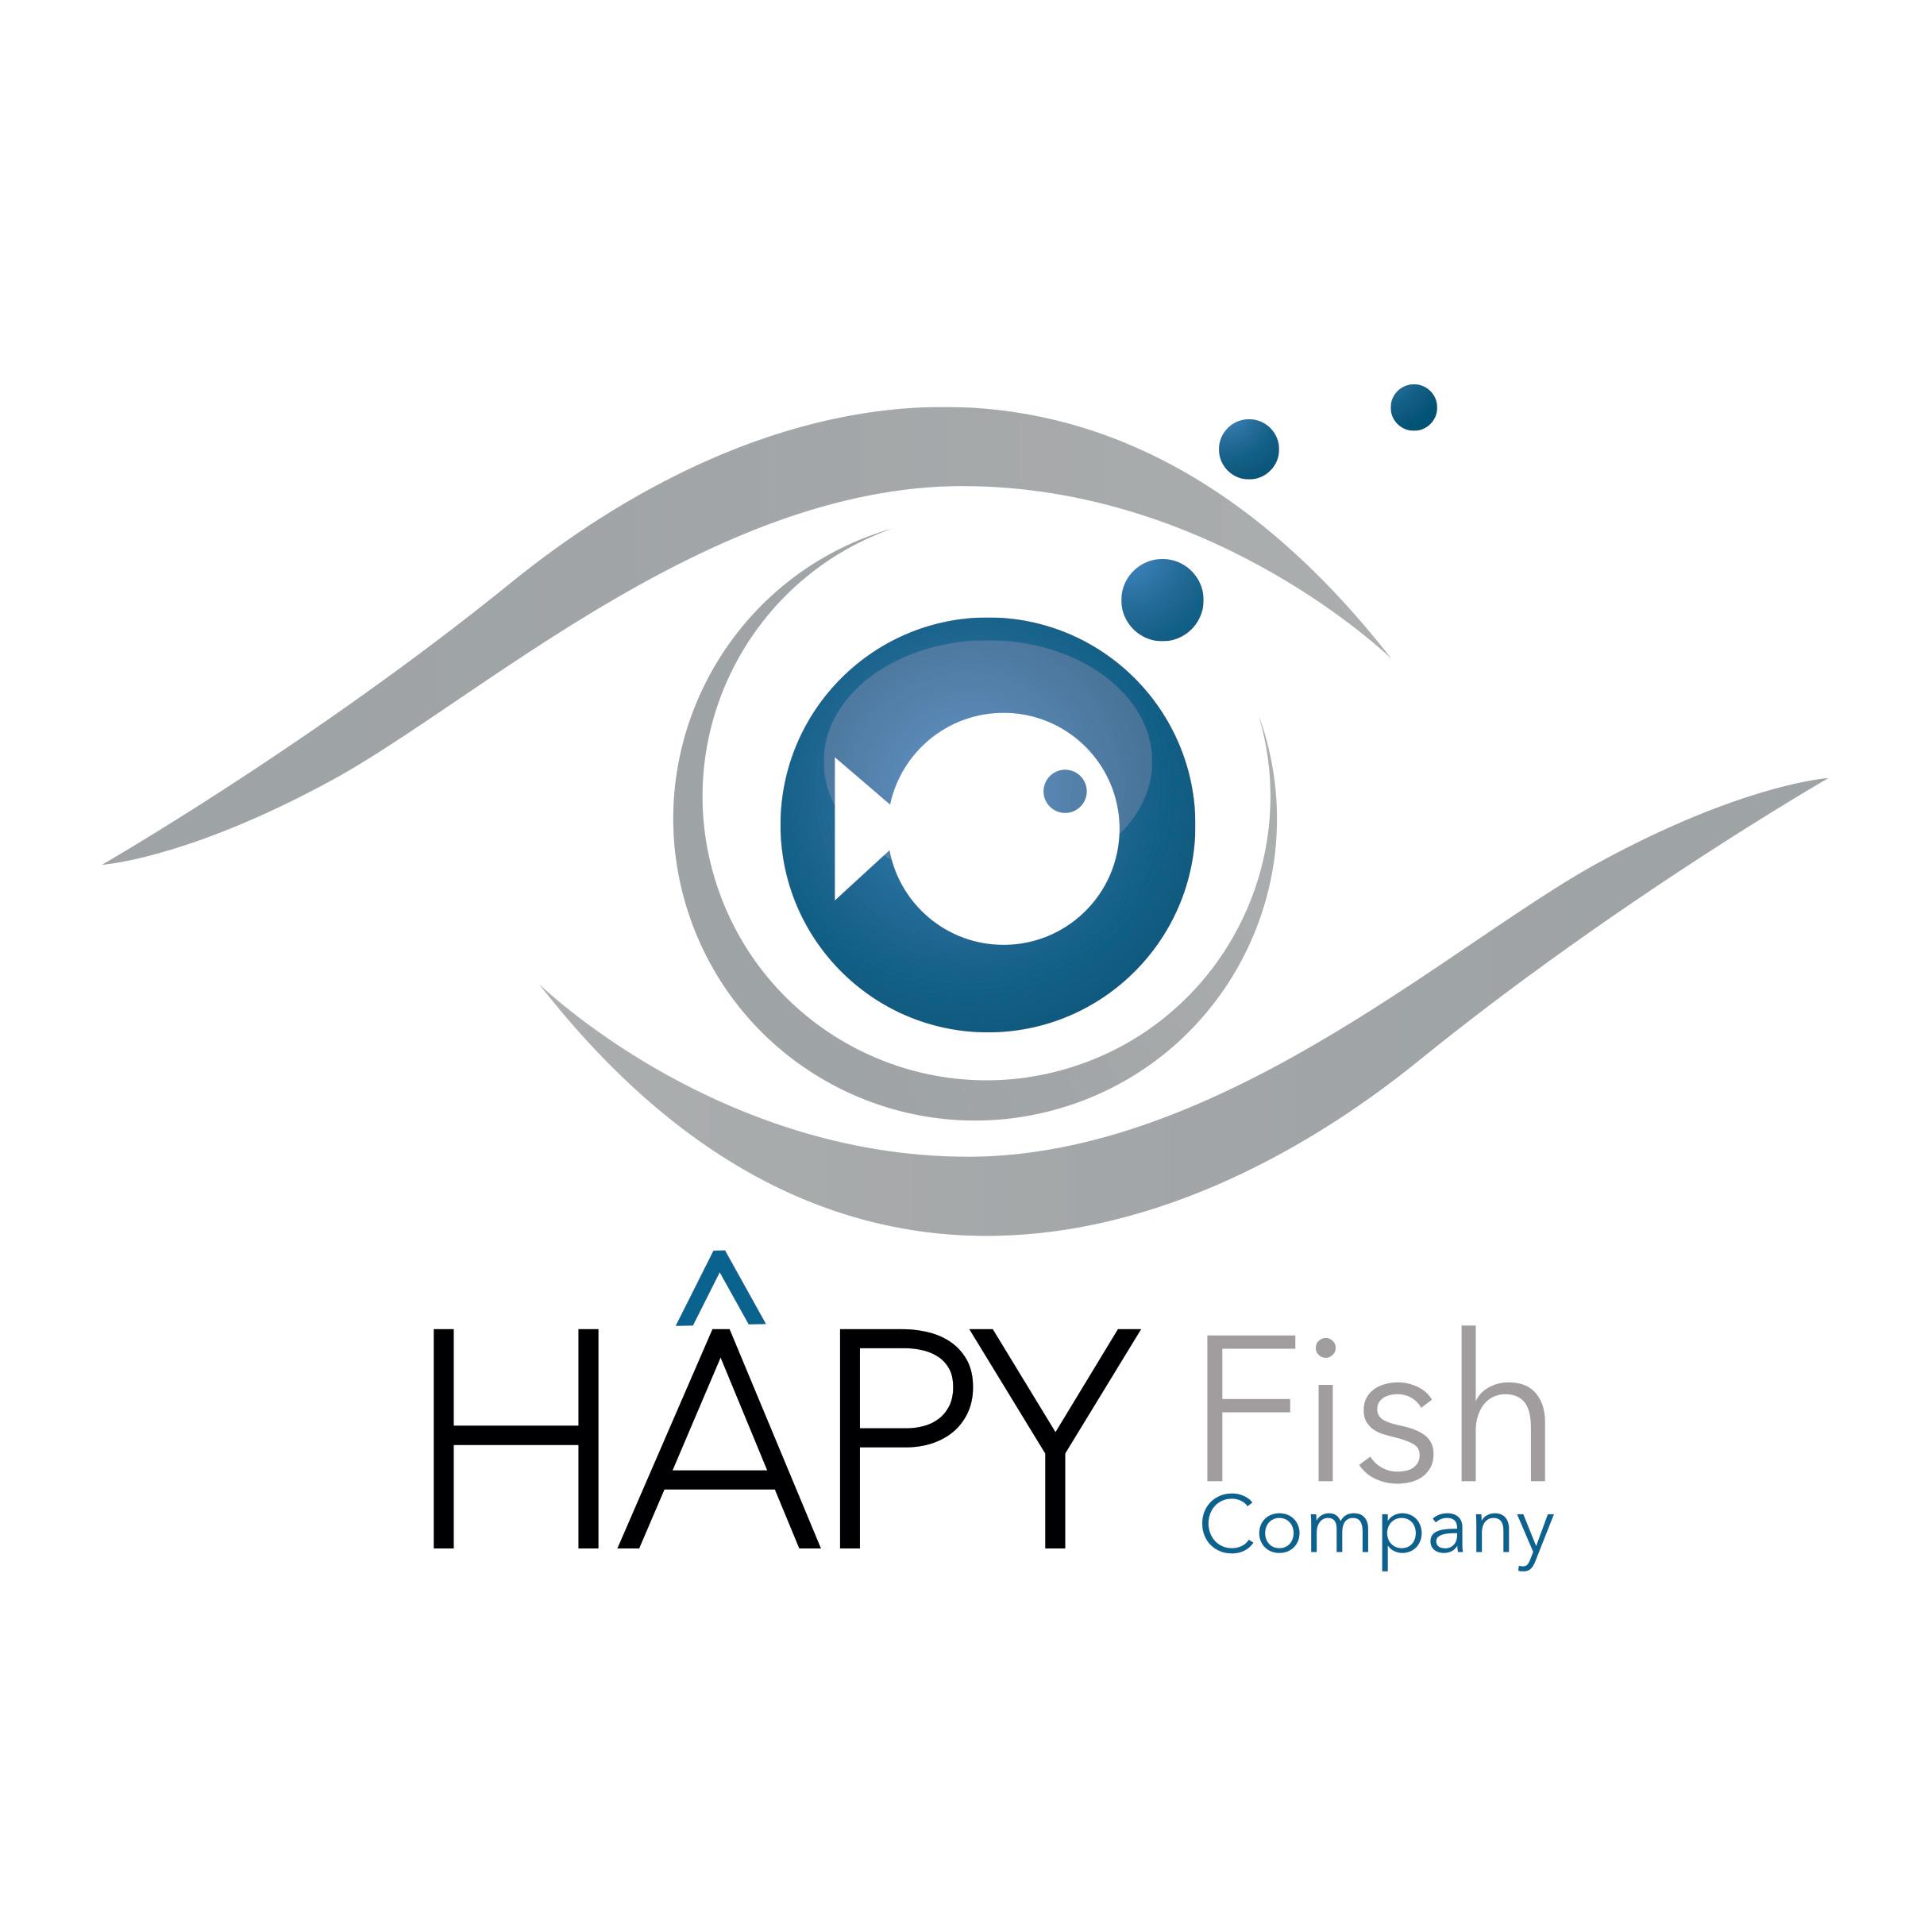 HÂPYFISH COMPANY